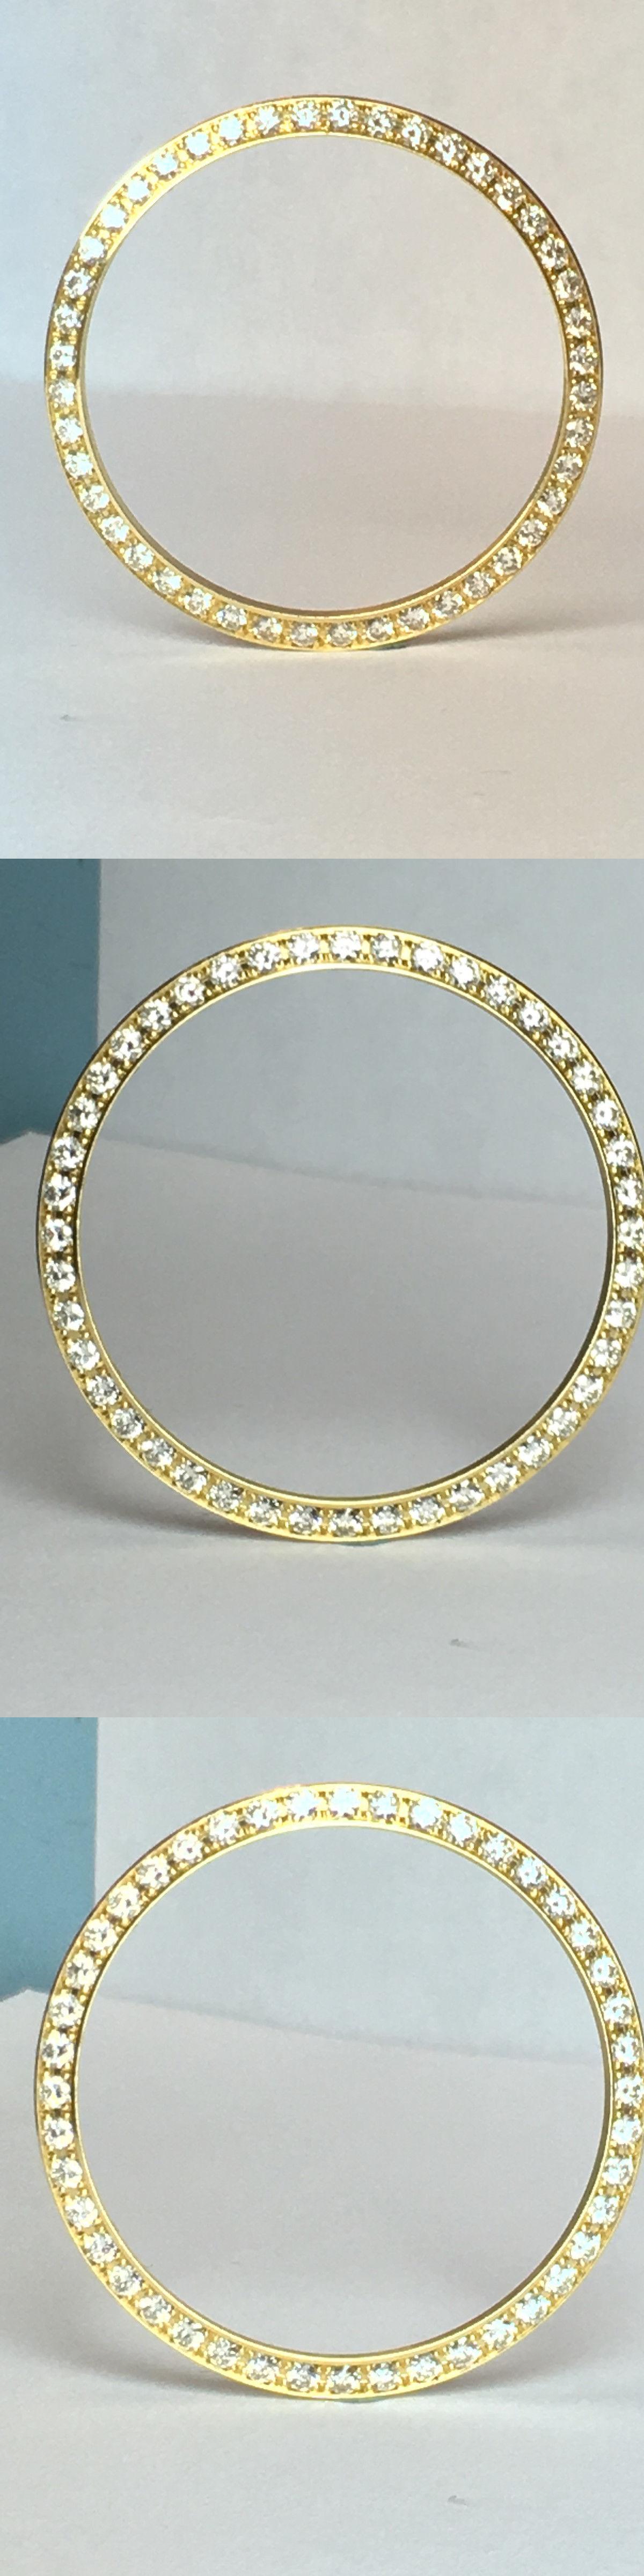 Bezels and inserts diamond watch bezel fit to men s rolex